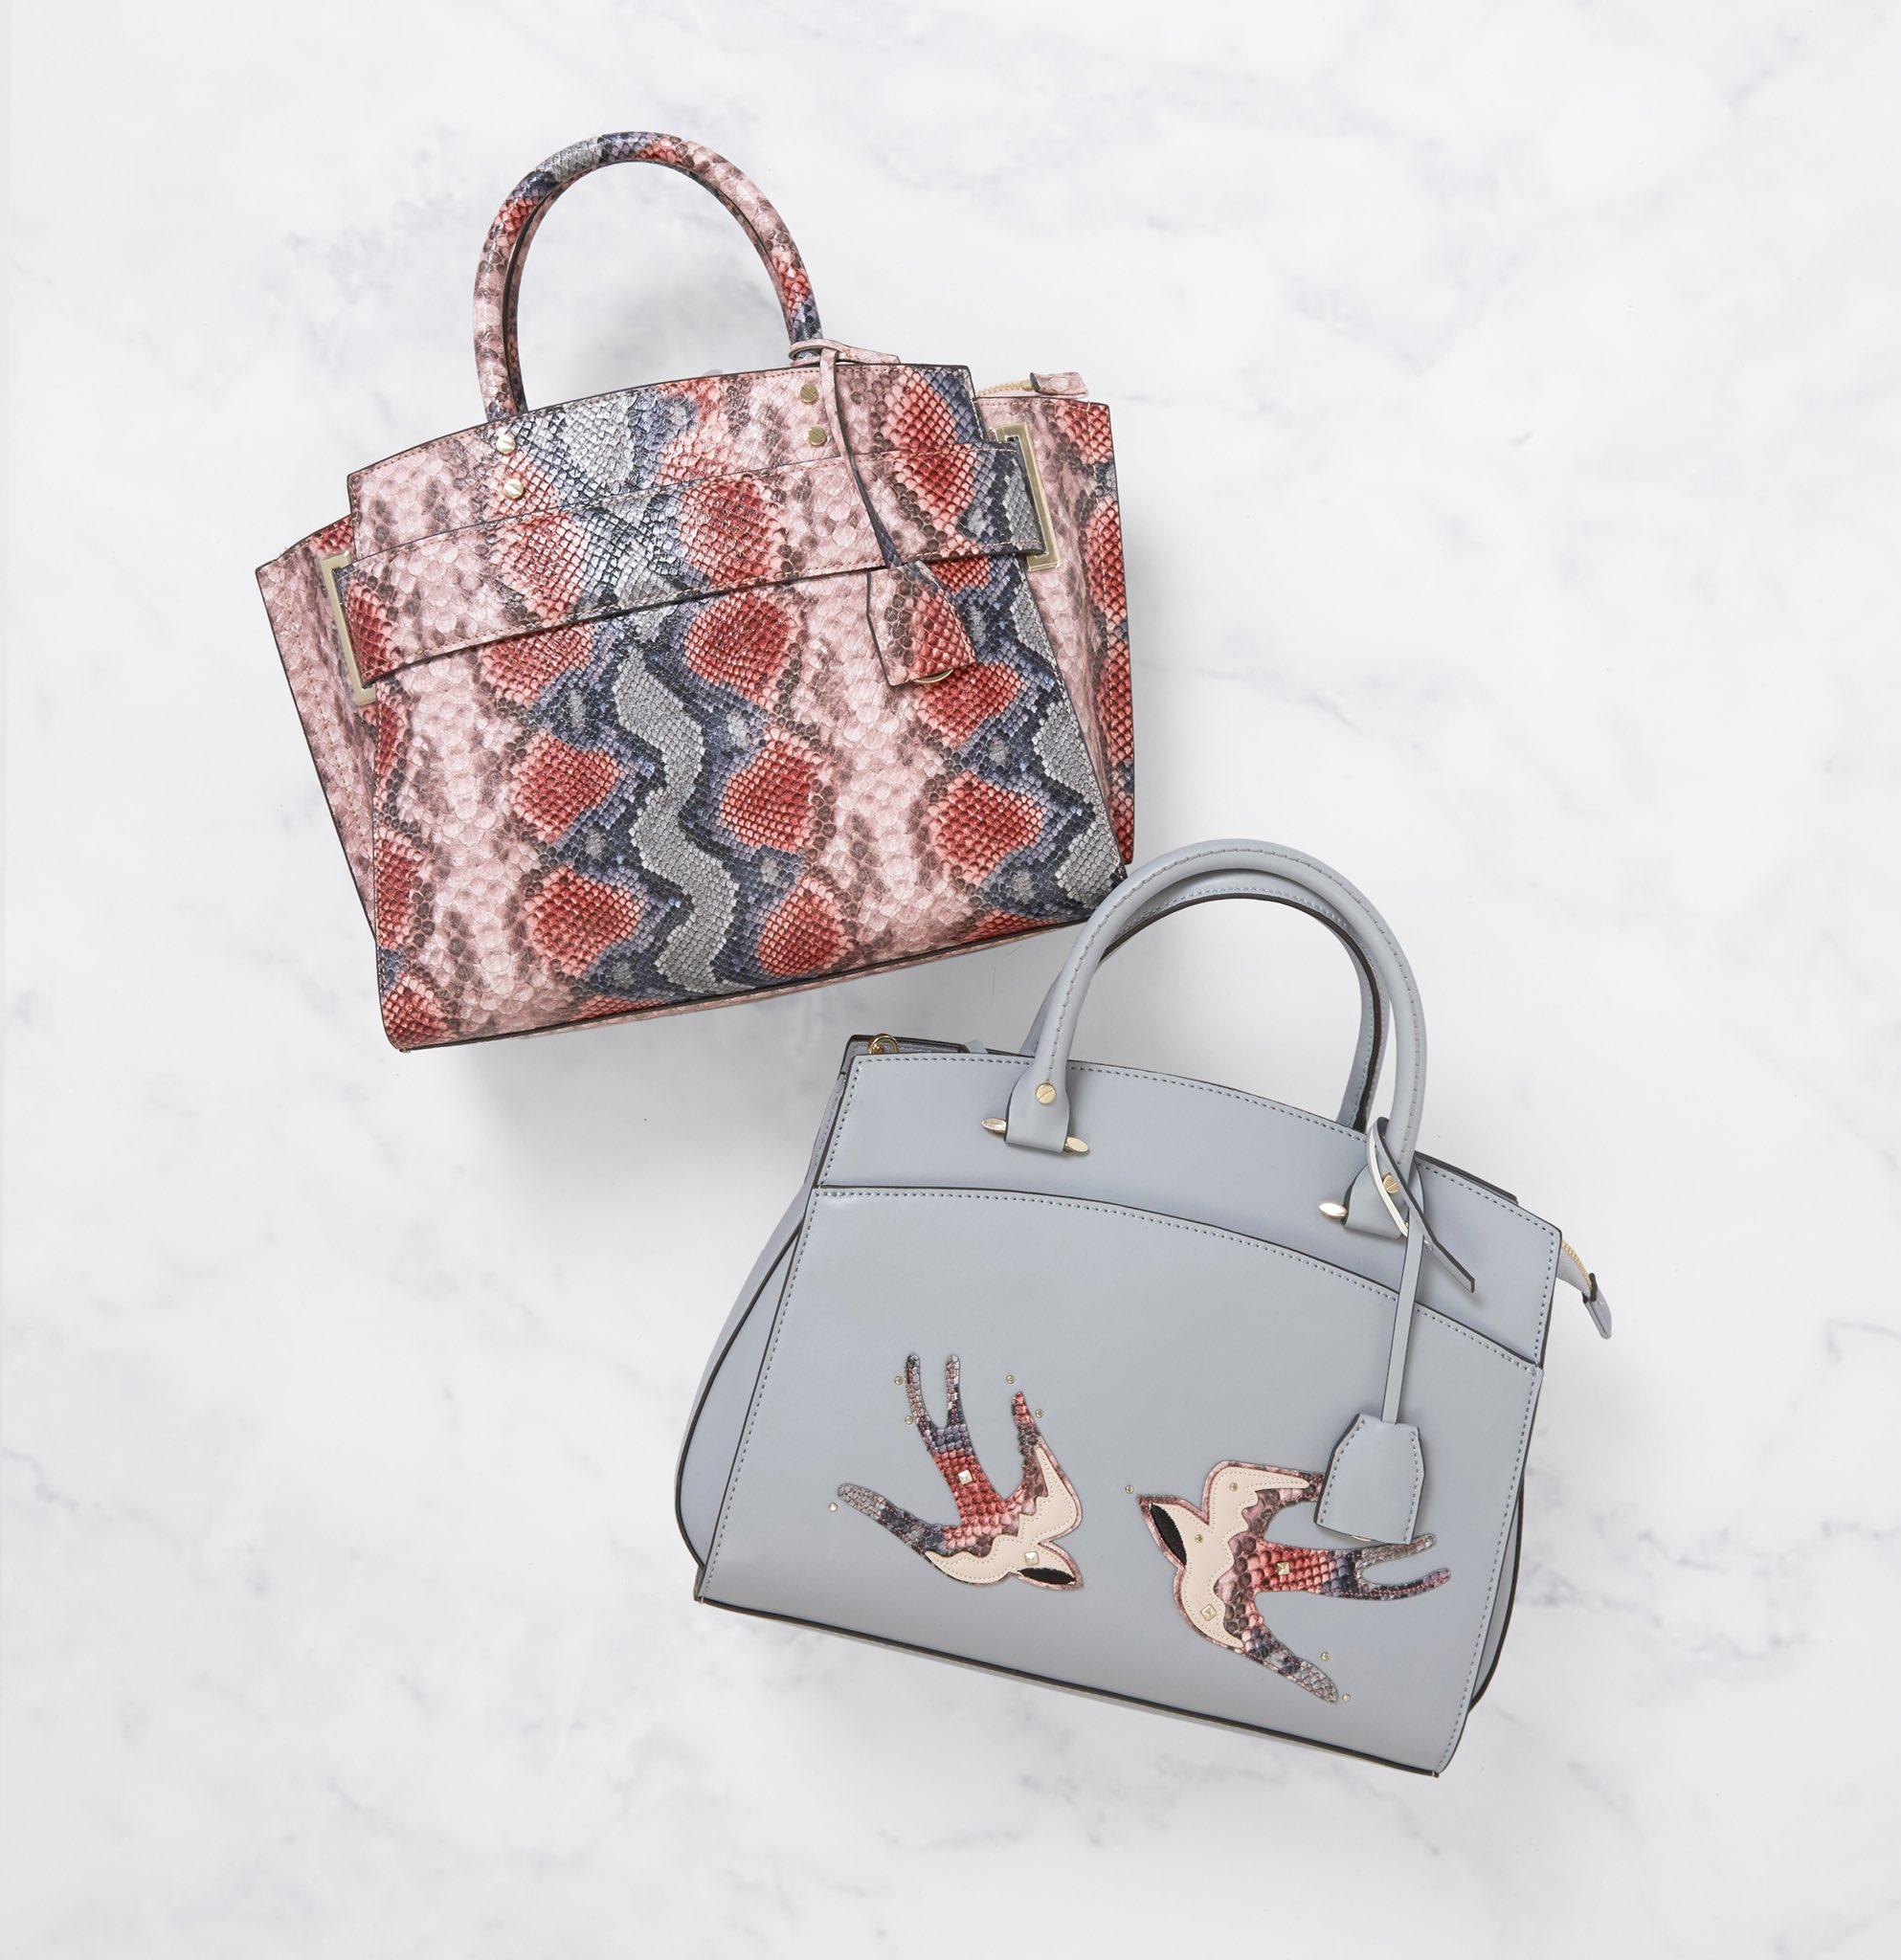 Flaunt your unique sense of style with my beautiful #JLoxKohls handbags @Kohls: https://t.co/TTvQNxOlkL https://t.co/k3m8wBXKxU